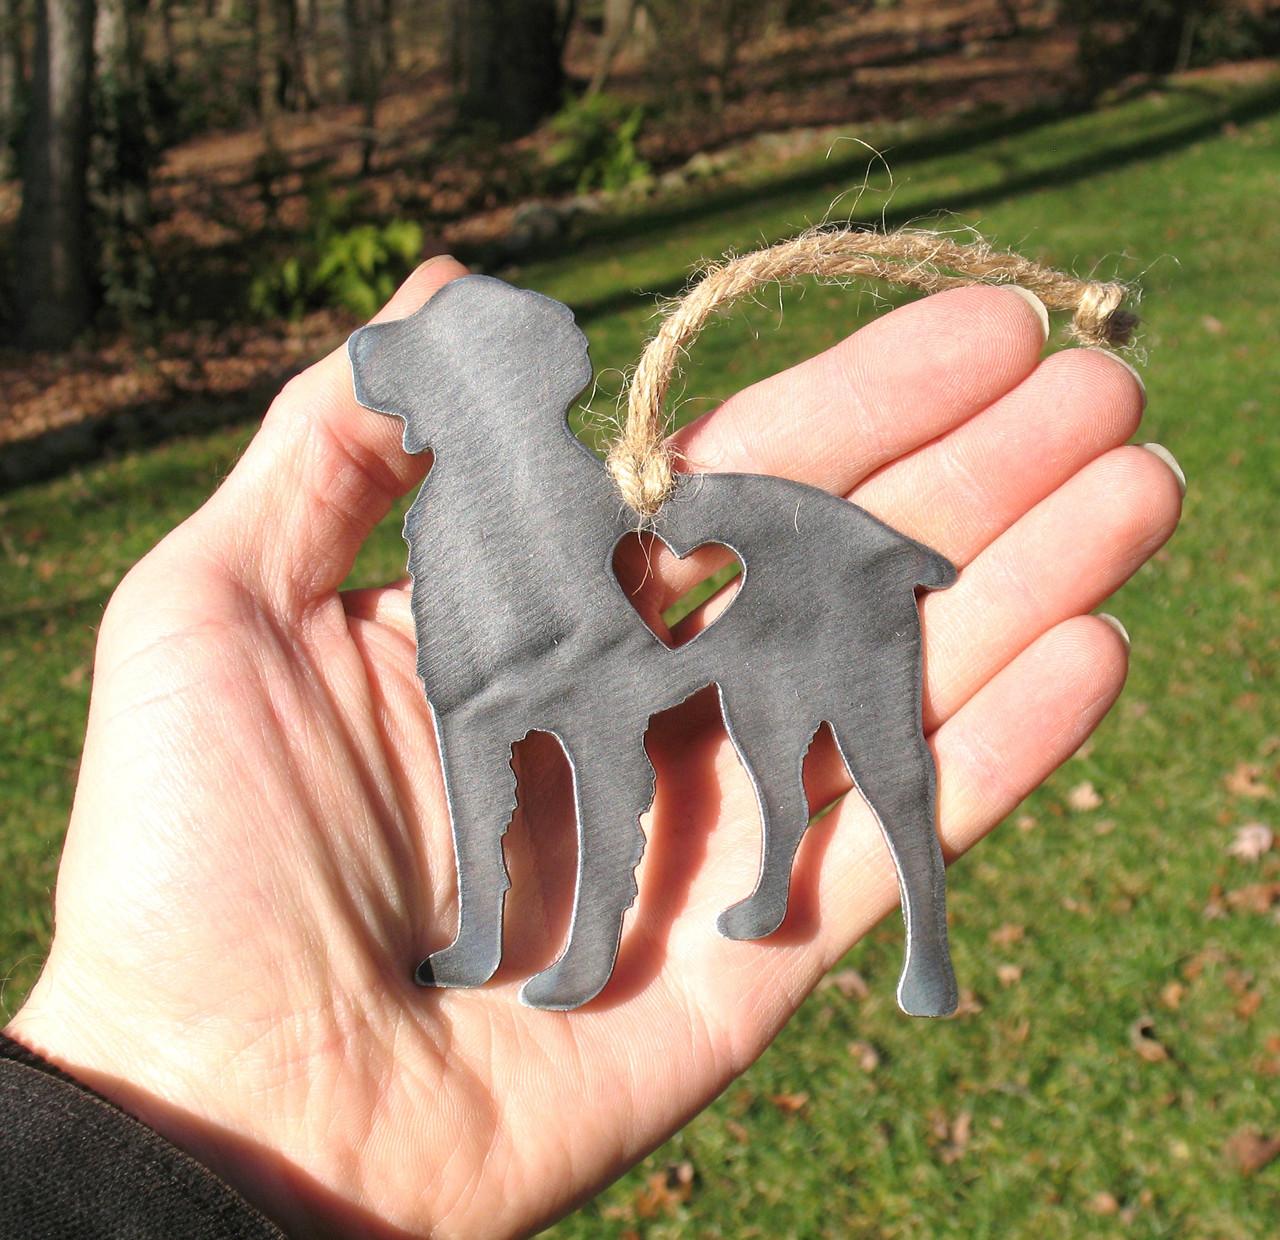 Brittany Spaniel Dog Ornament 1 - Metal Dog Christmas Ornament - Pet Lover Memorial Ornament - Pet Loss Dog Memorial Remembrance Gift